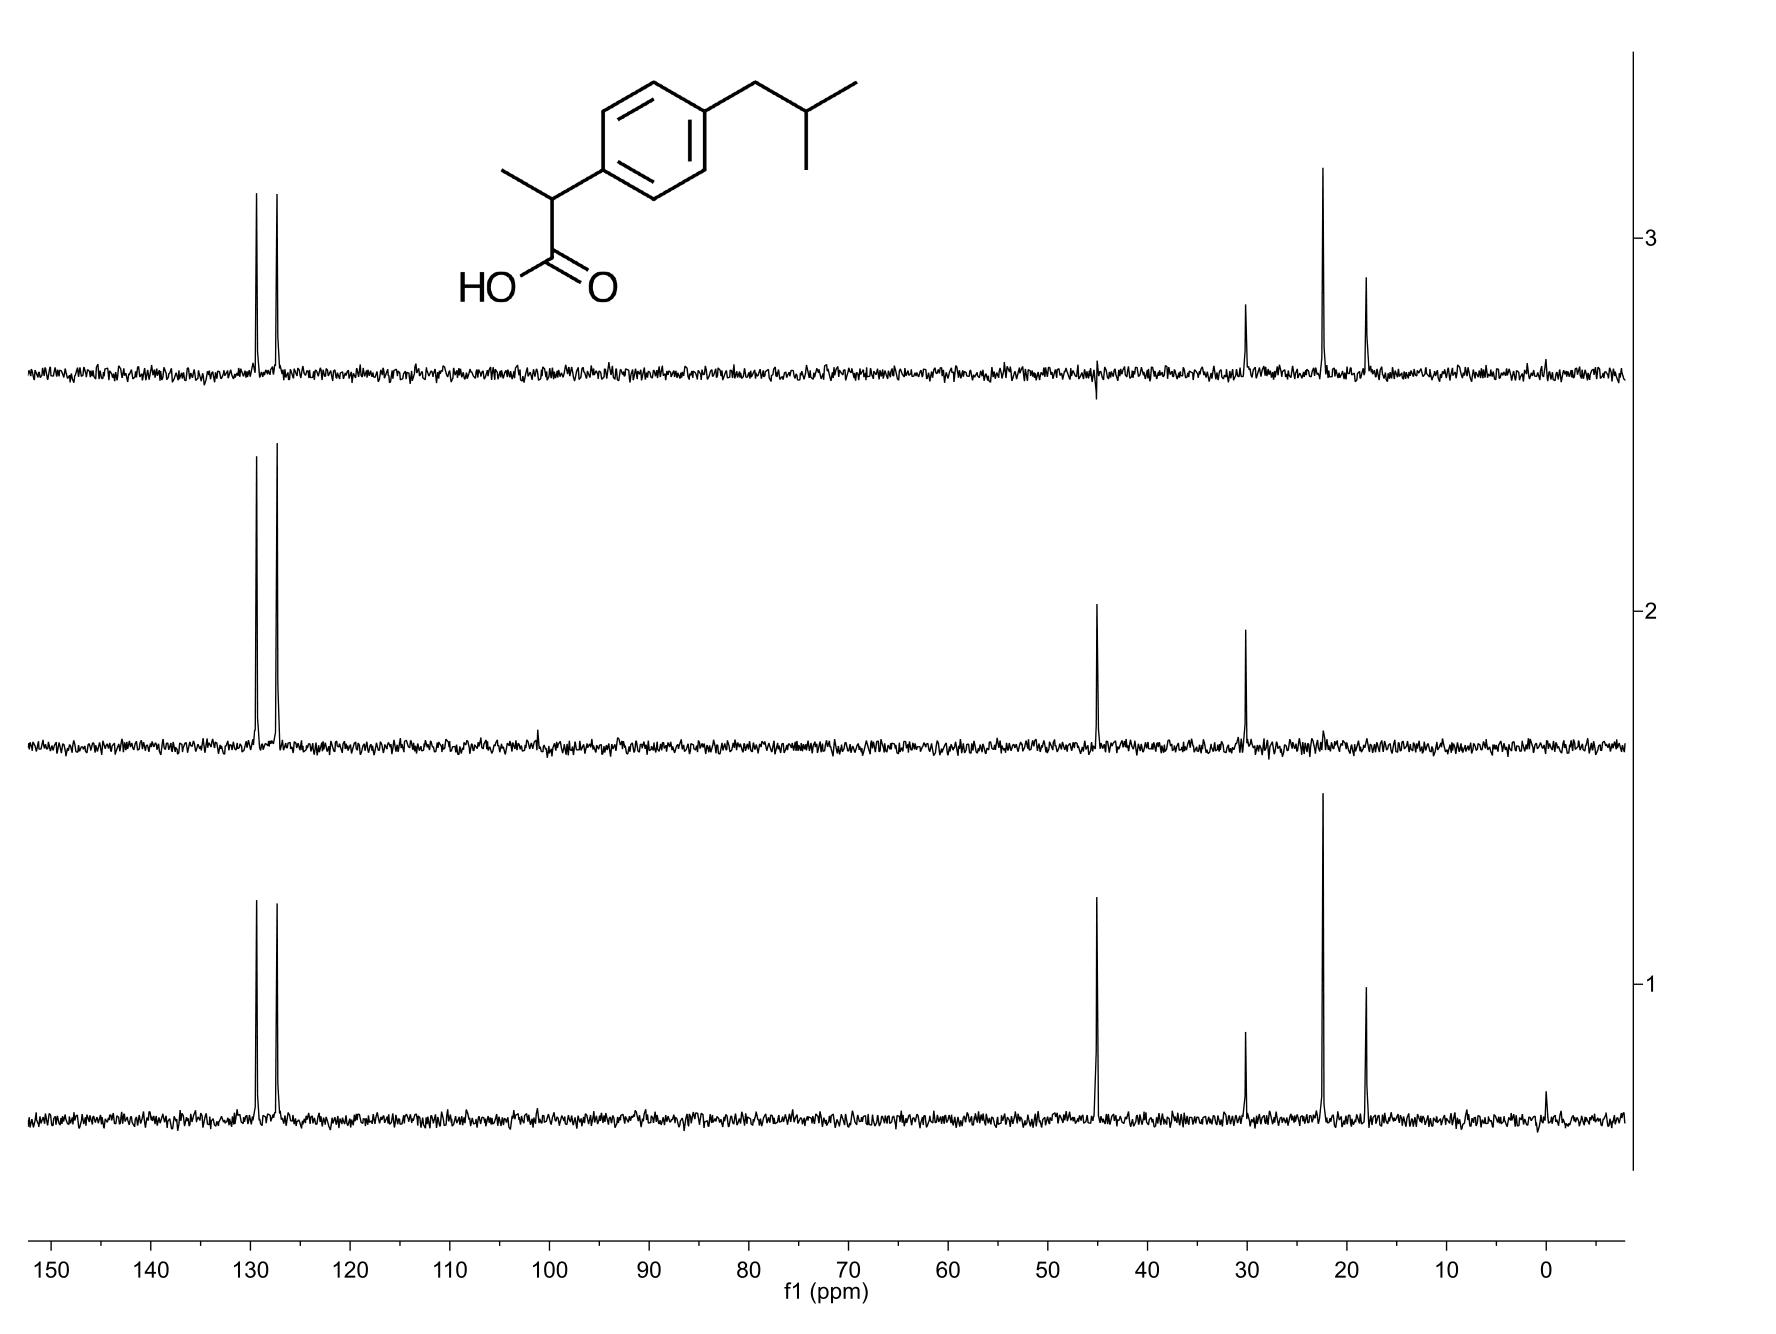 Anasazi Instruments 90MHz Ibuprofen DEPT with structure graph